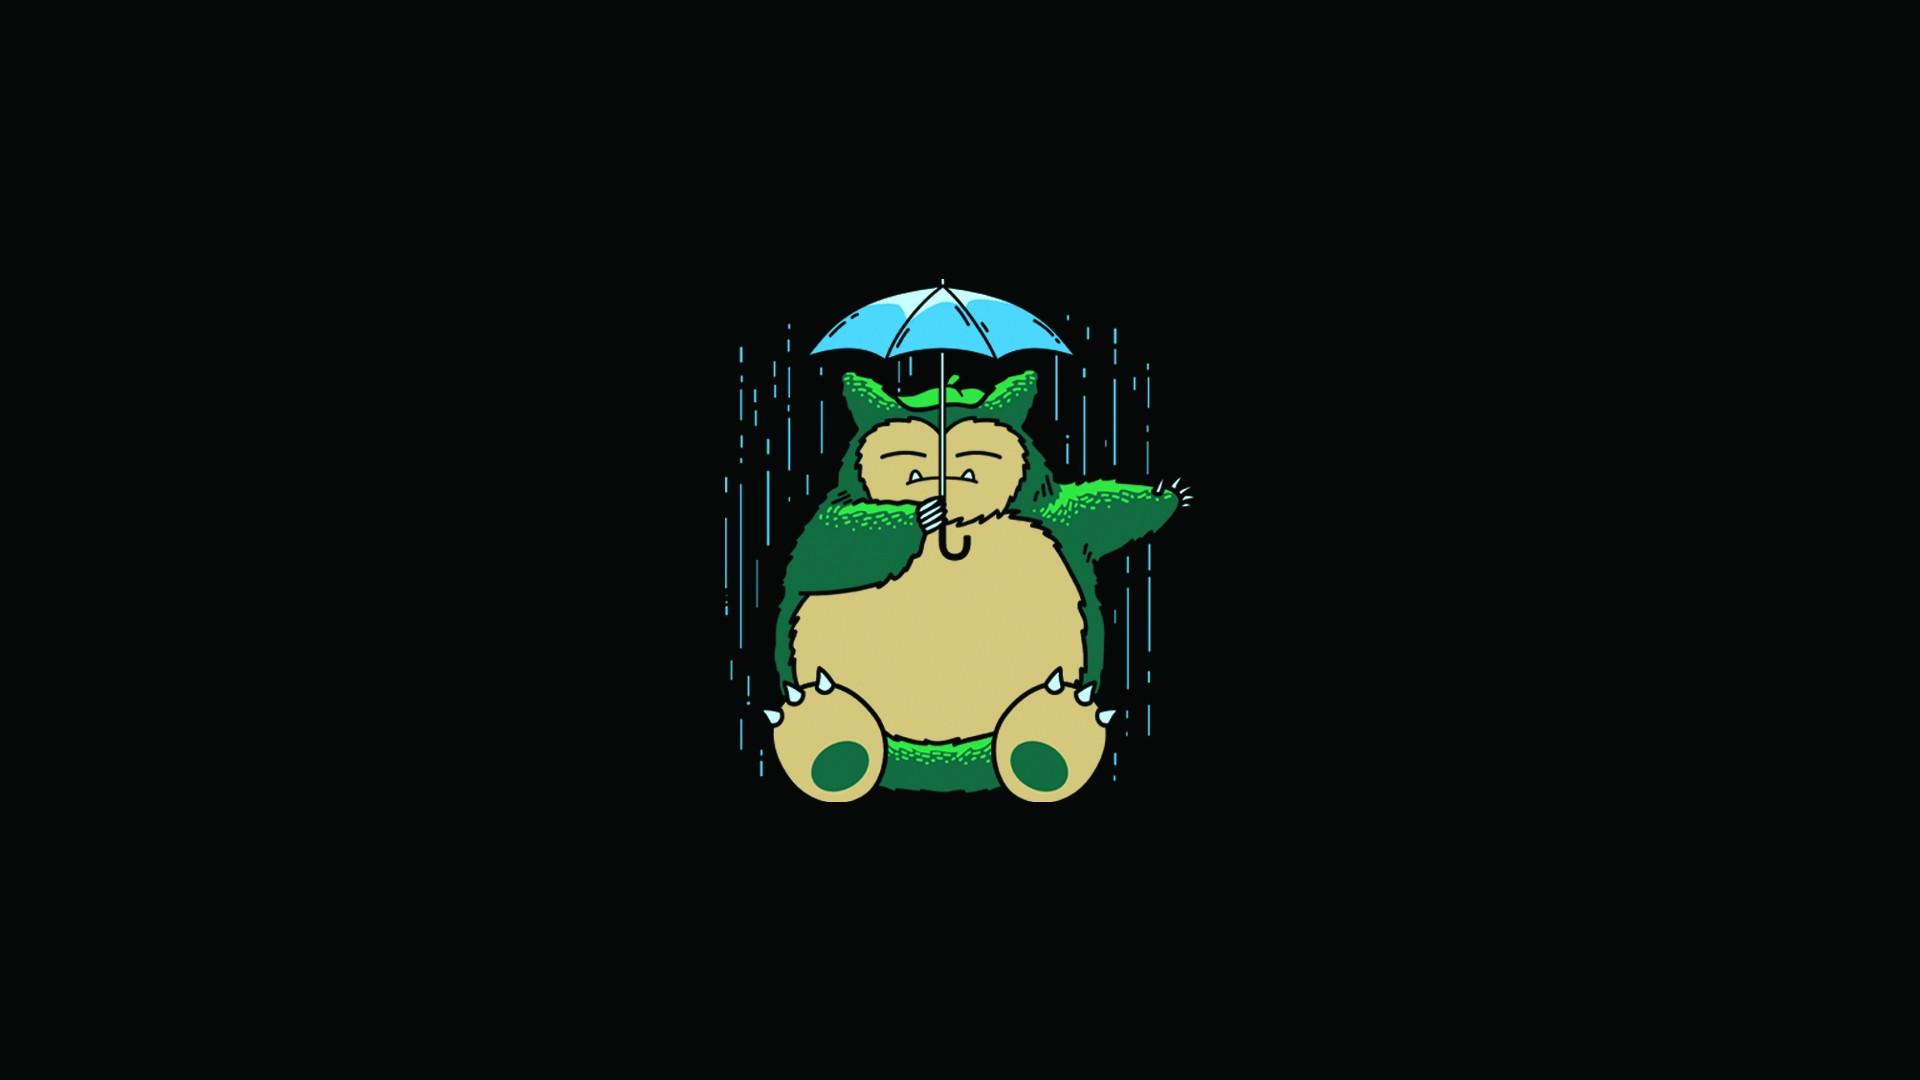 Free Download My Neighbor Totoro Totoro Anime Umbrella Rain